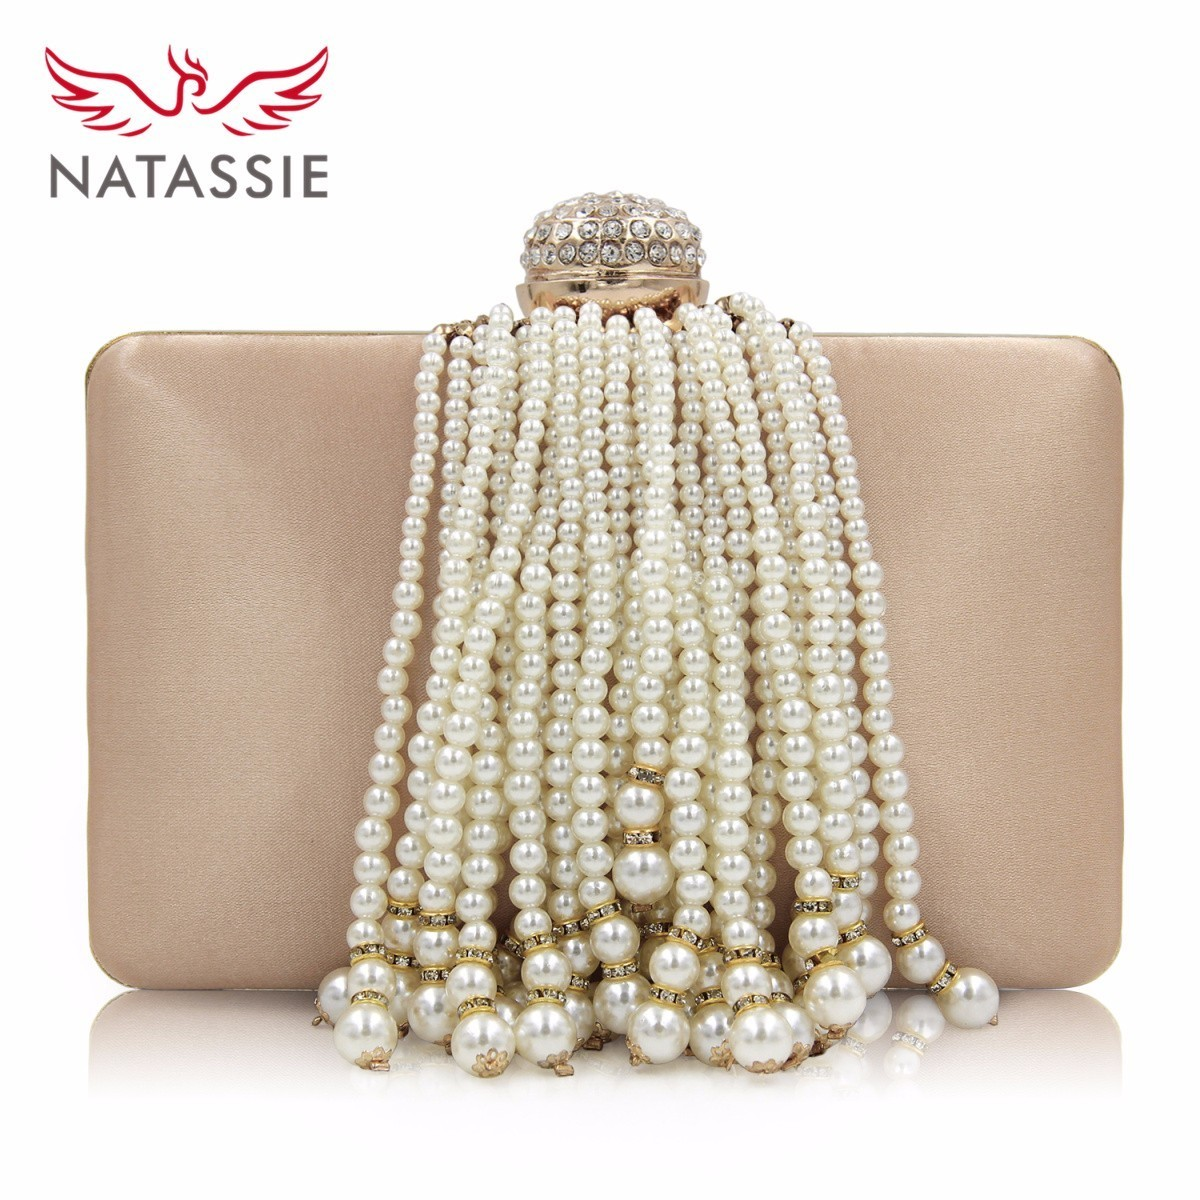 f3c893fdd9e NATASSIE Pearl Tassel Women Clutch Bag Female Evening Bags Ladies Gold Clutch  Purses Girl Party Wedding